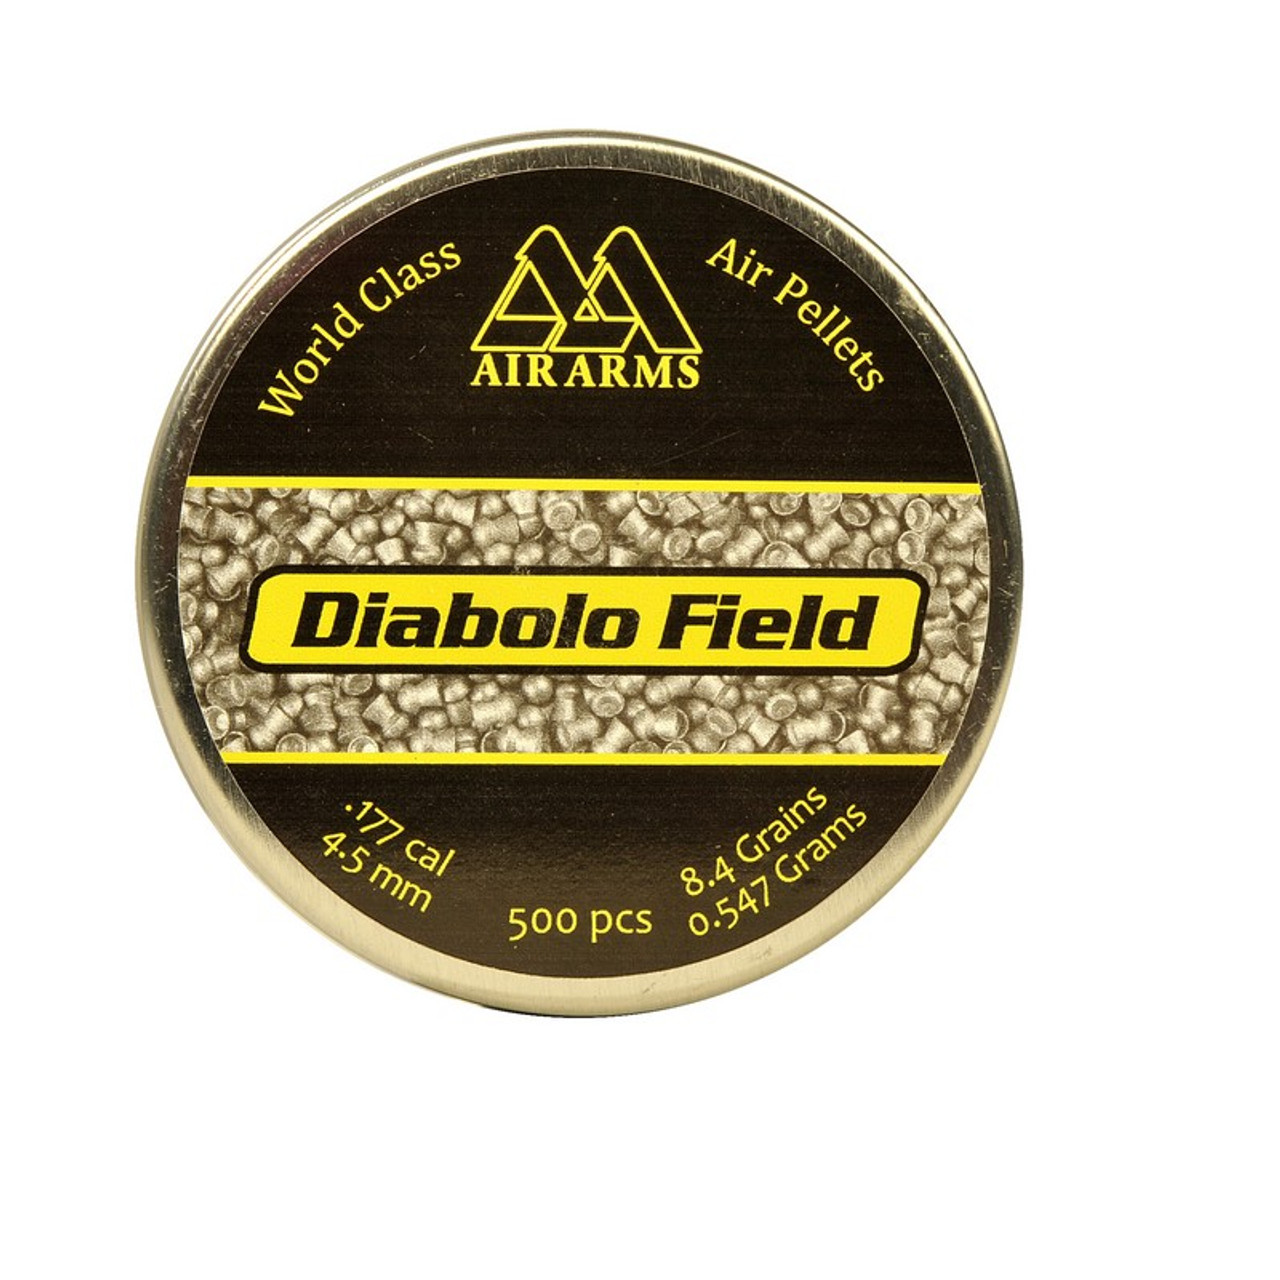 best price for Air Arms Diablo Field .177 Pellets, on sale at Bradford Stalker